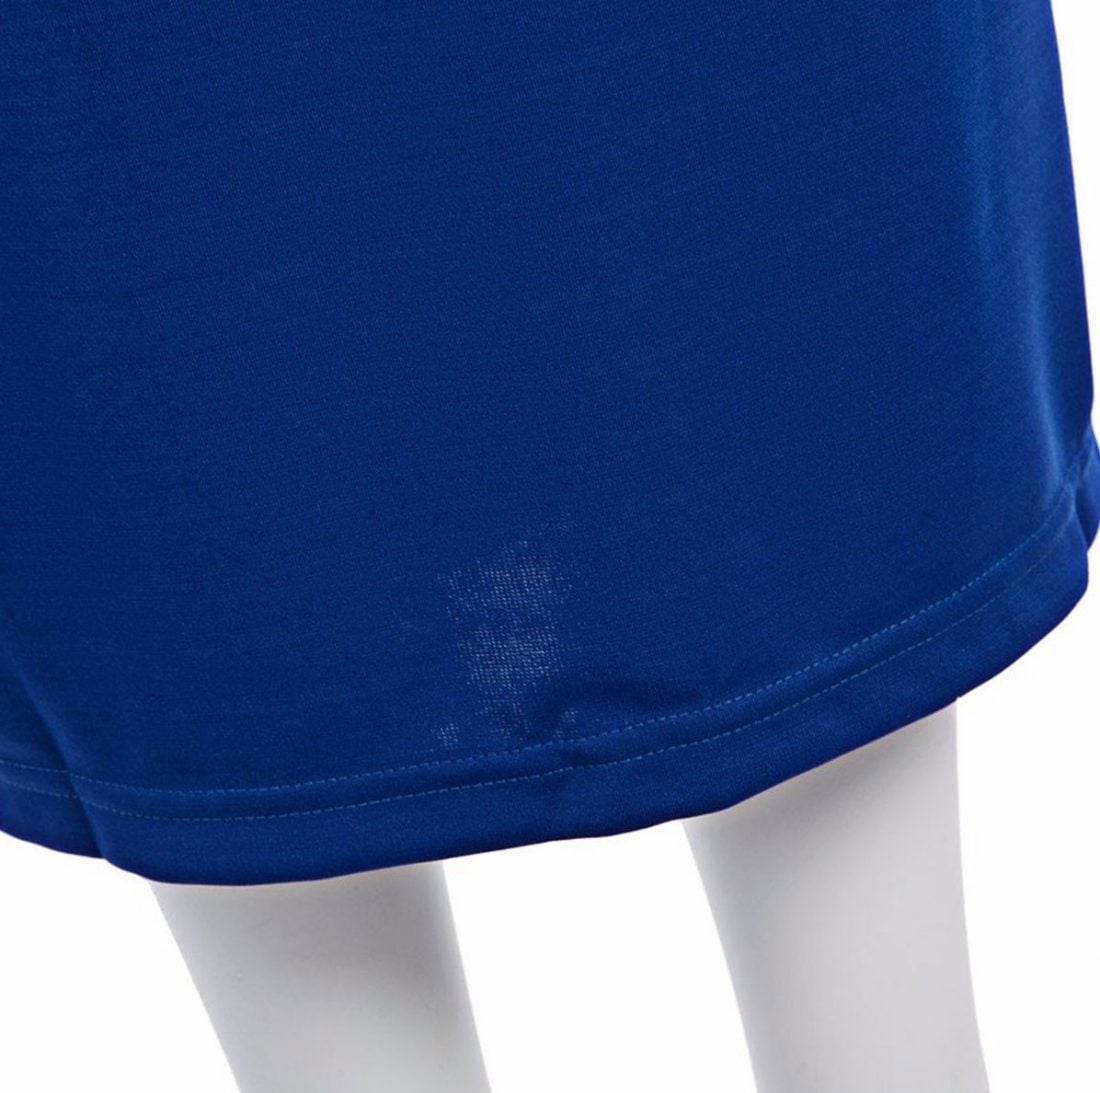 M0185 blue10 Office Evening Dresses maureens.com boutique